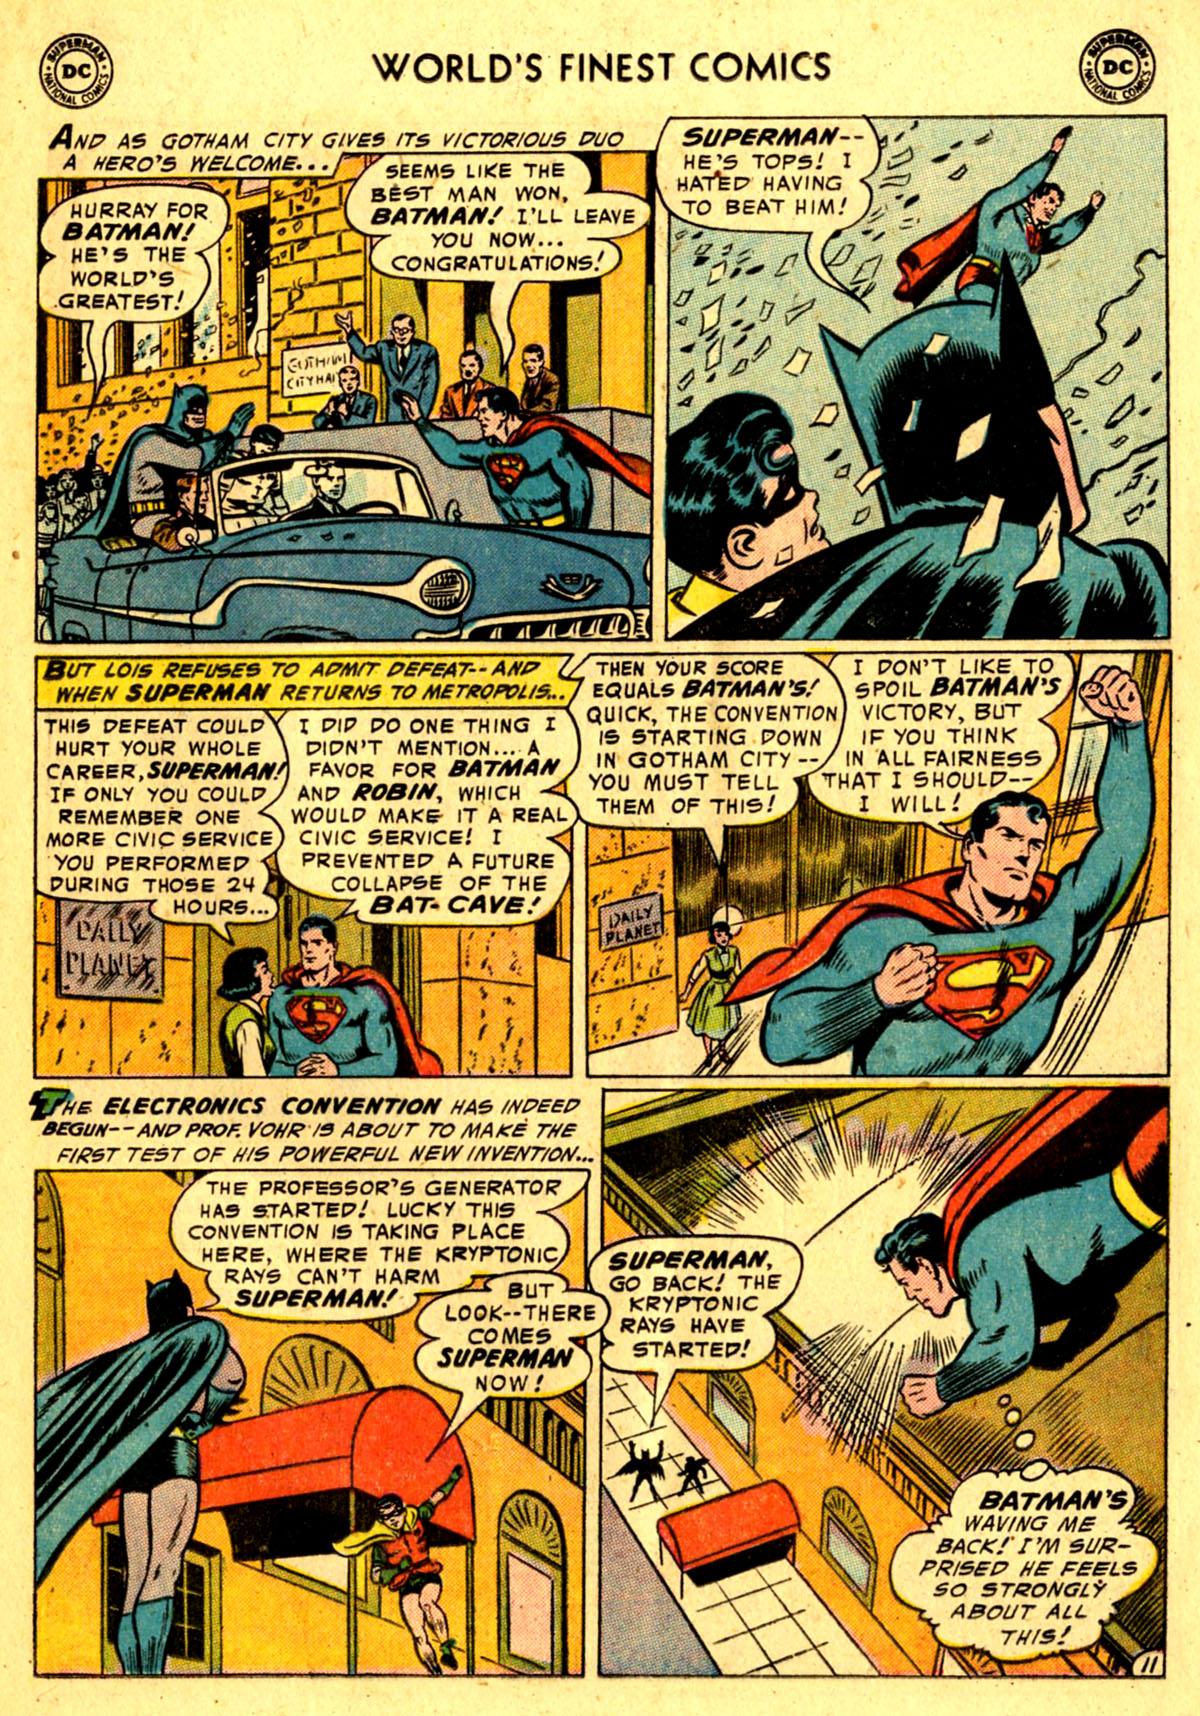 Read online World's Finest Comics comic -  Issue #76 - 13